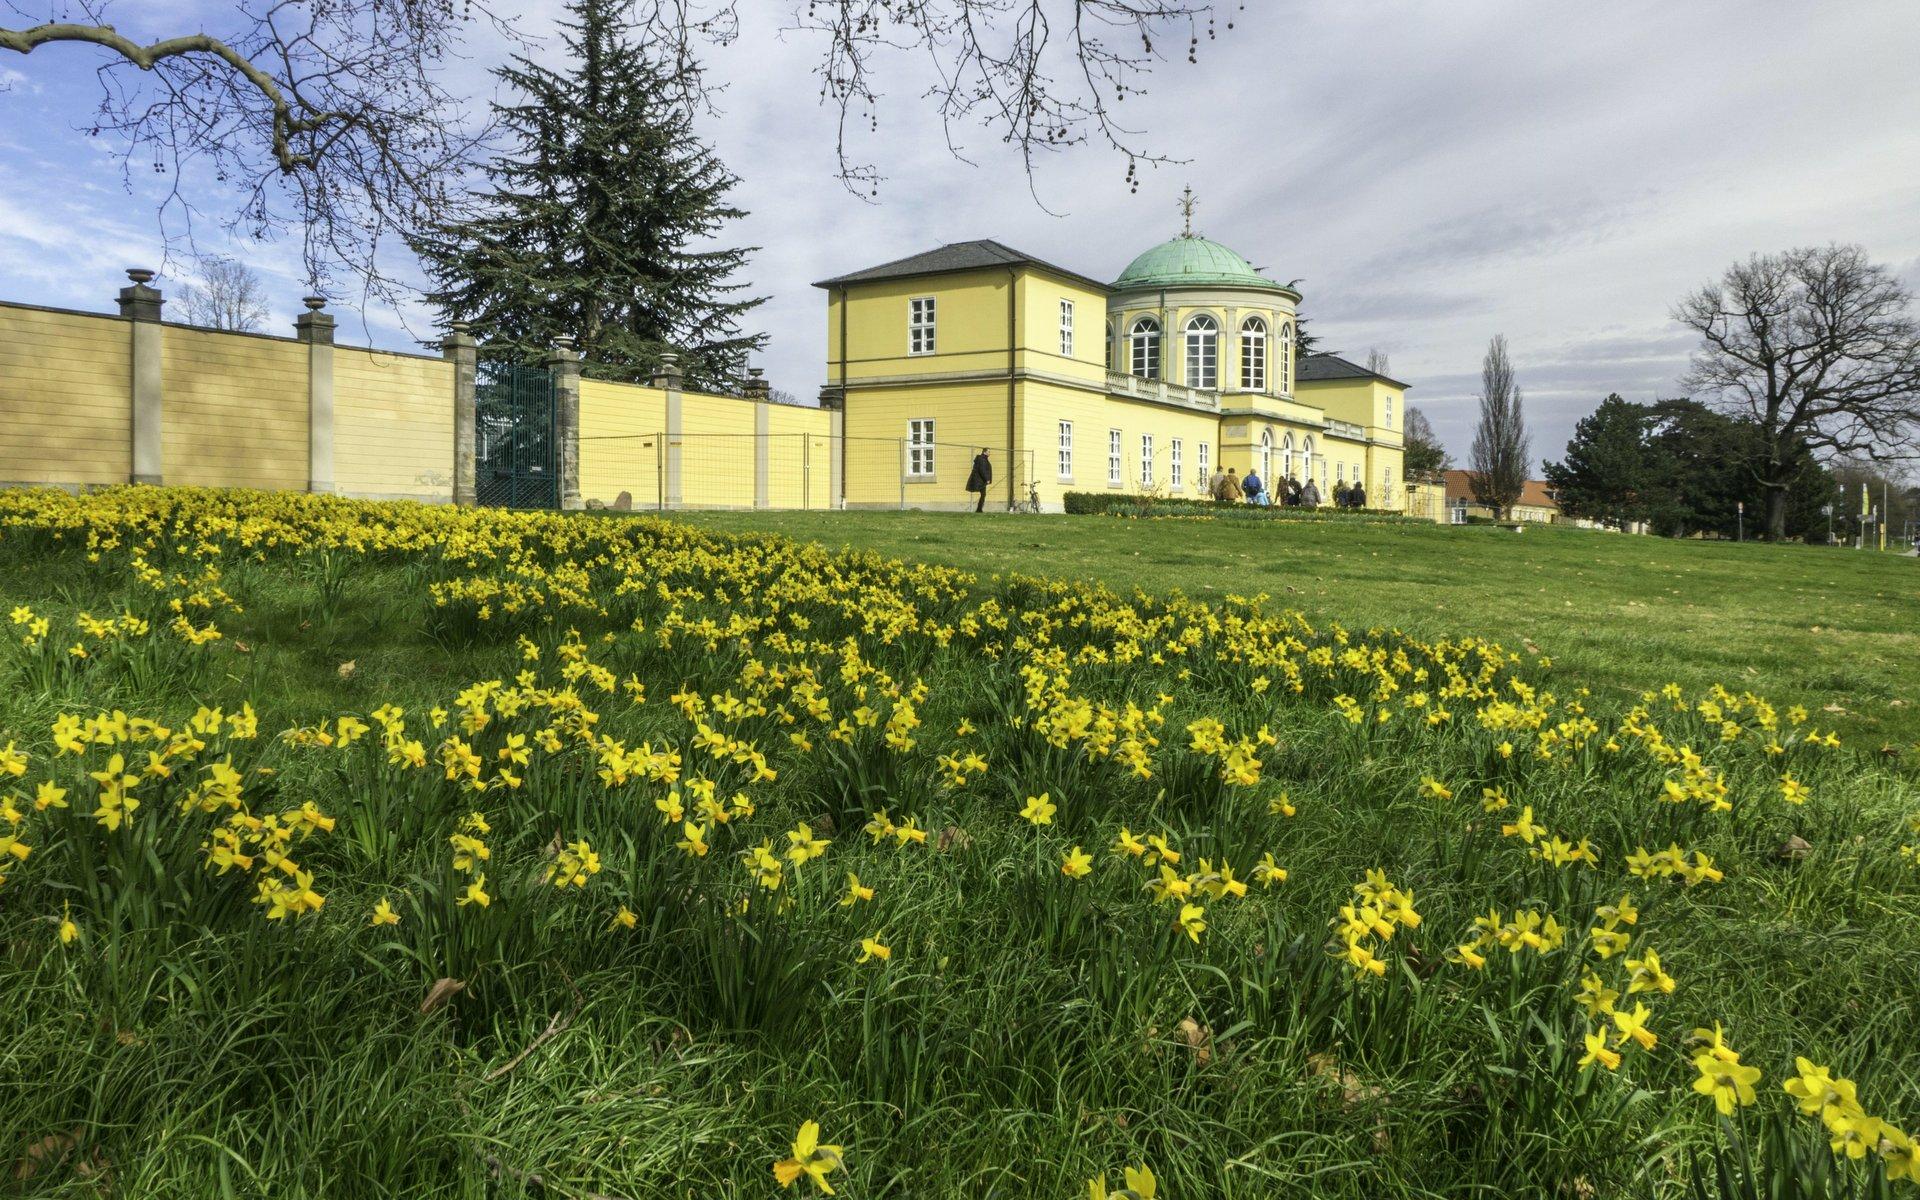 Osterglocken vor dem Bibliothekspavillion vor dem Berggarten